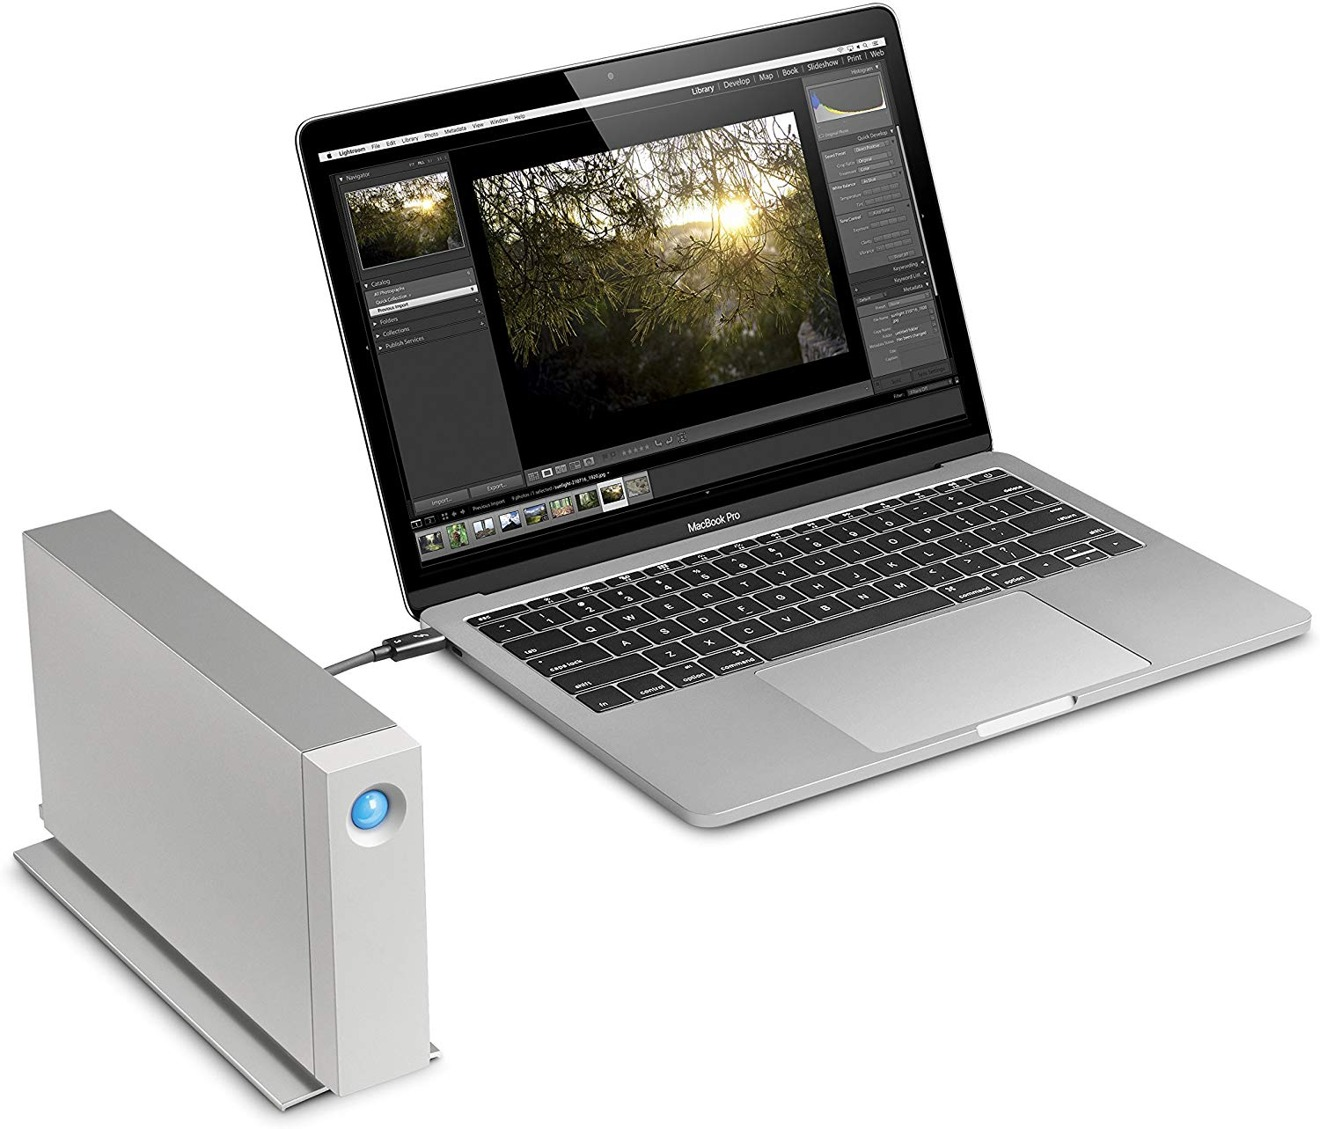 LaCie d2 Thunderbolt 3 USB-C Drive